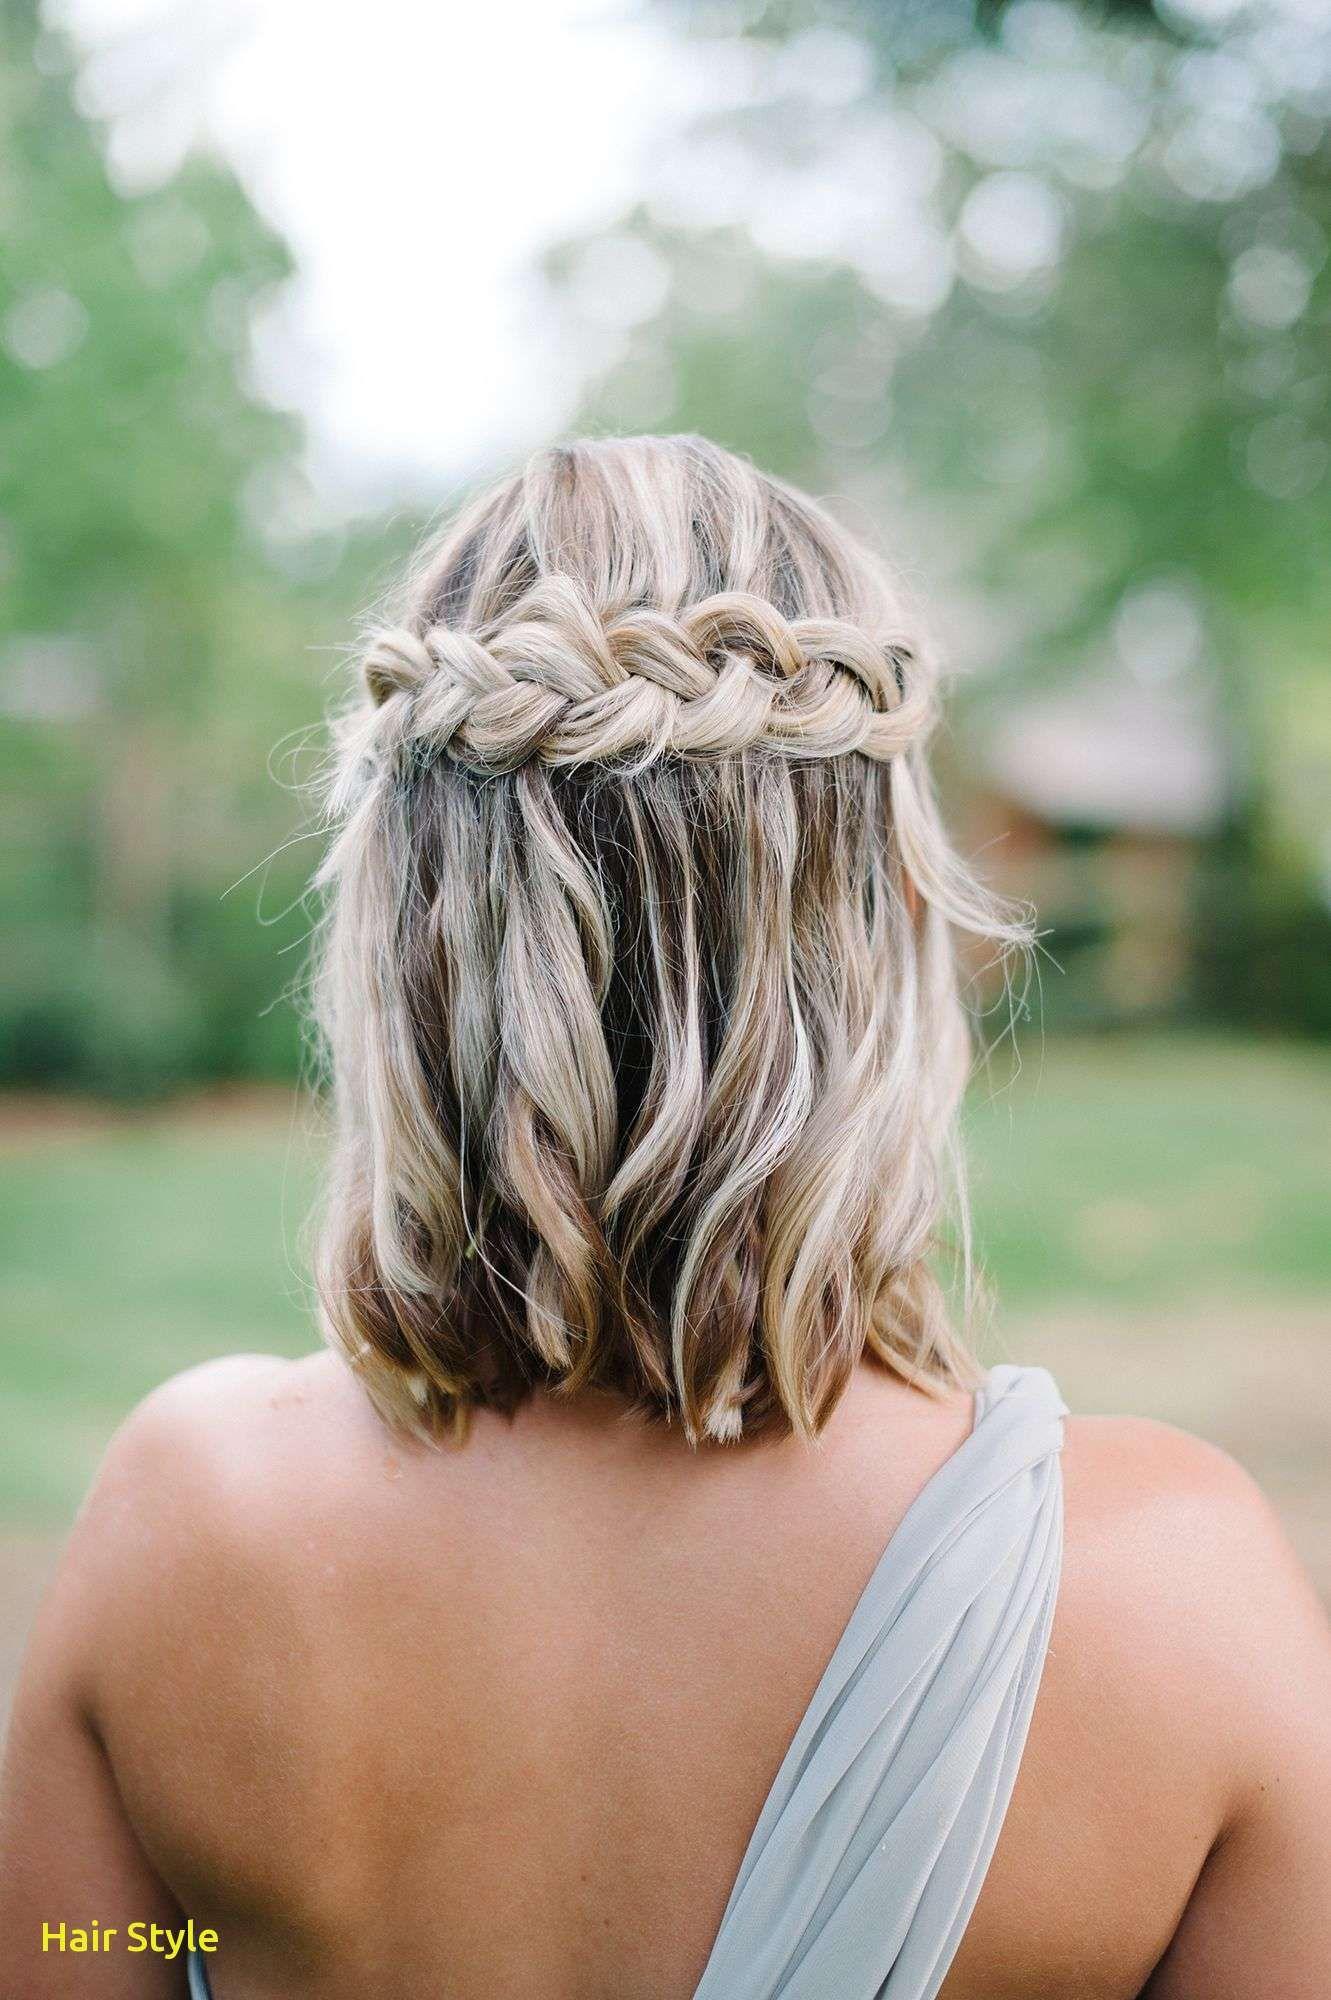 Schone Hochzeit Frisuren Fur Kurze Haare Frisuren Hochzeitsfrisuren Kurze Haare Kurze Haare Stylen